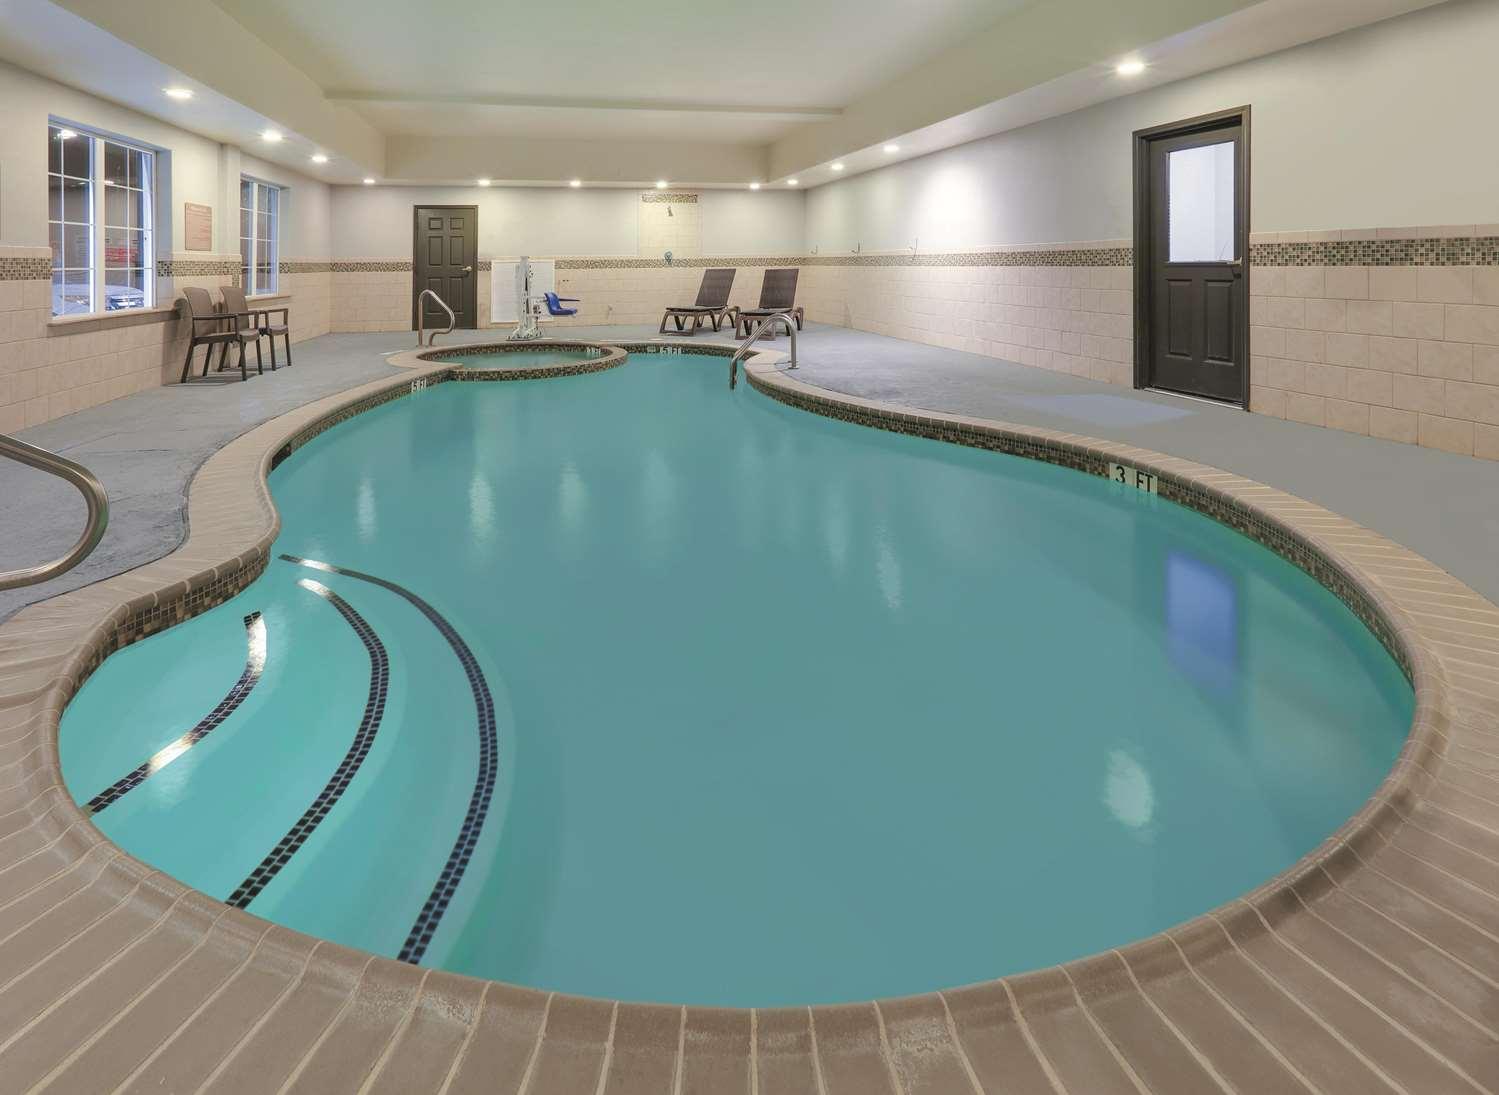 Pool - La Quinta Inn & Suites South Tyler